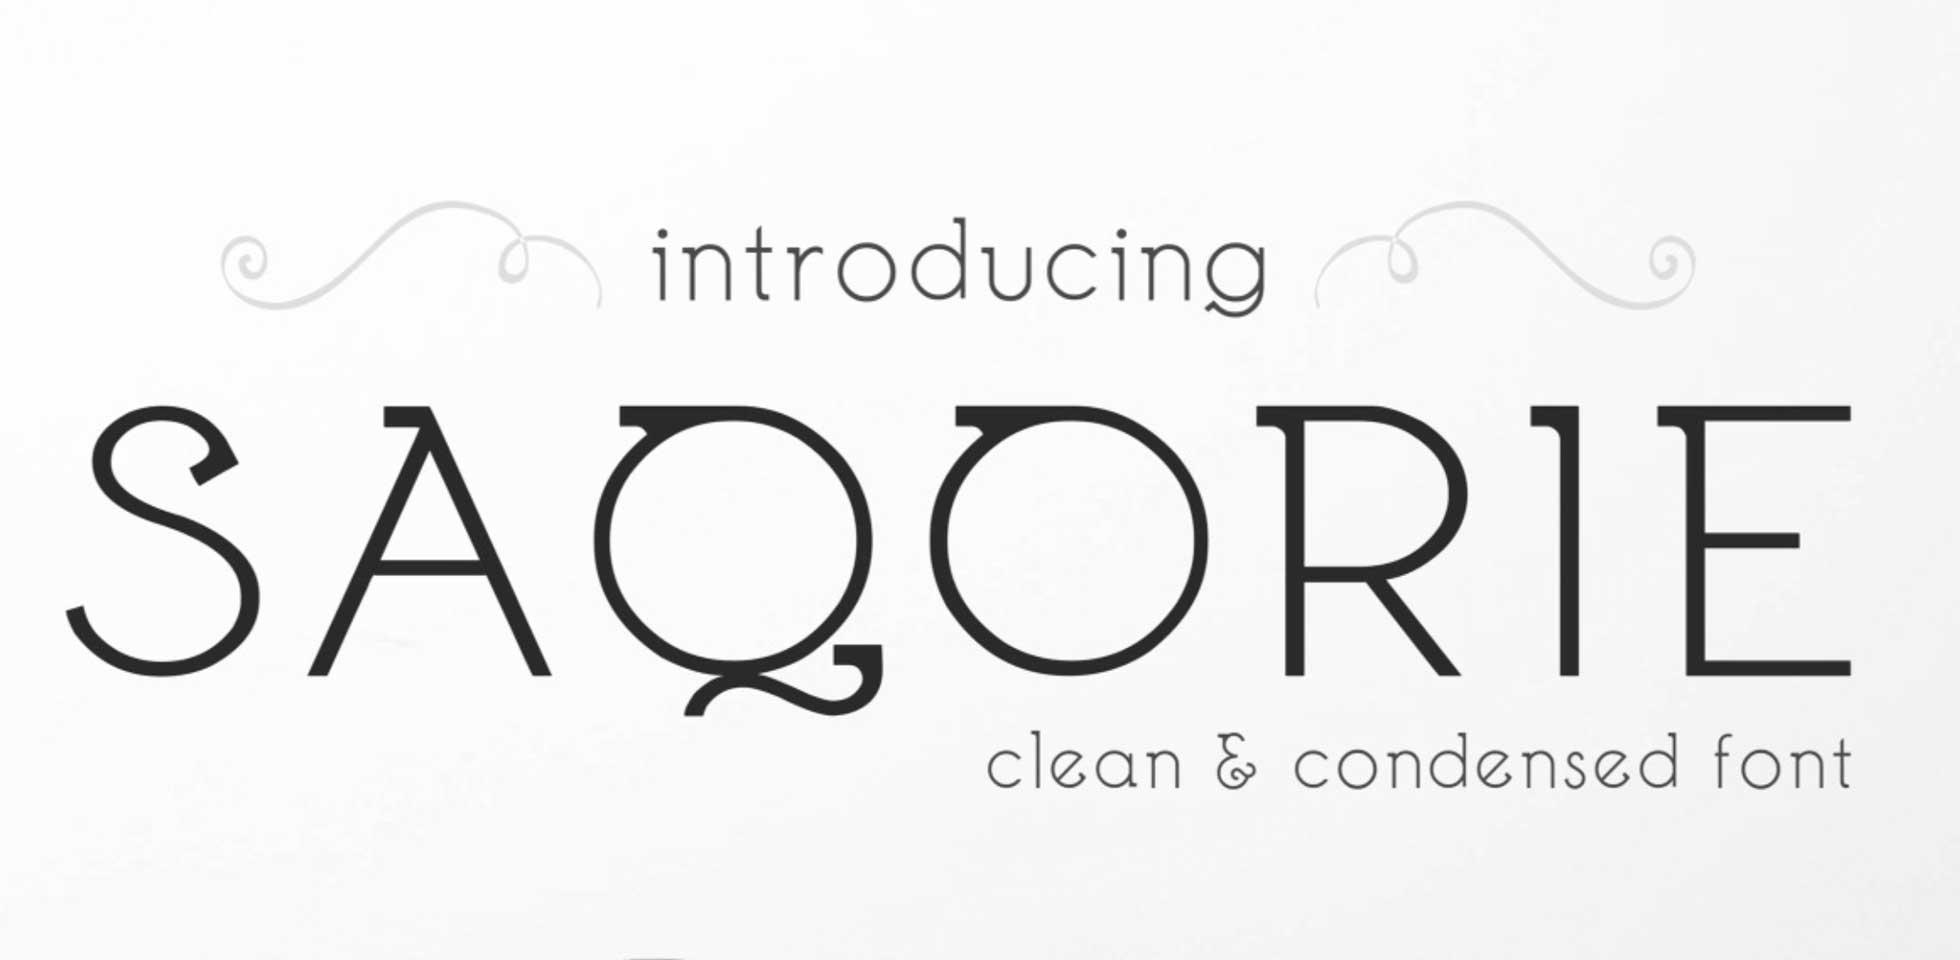 Free Download: Saqorie Font